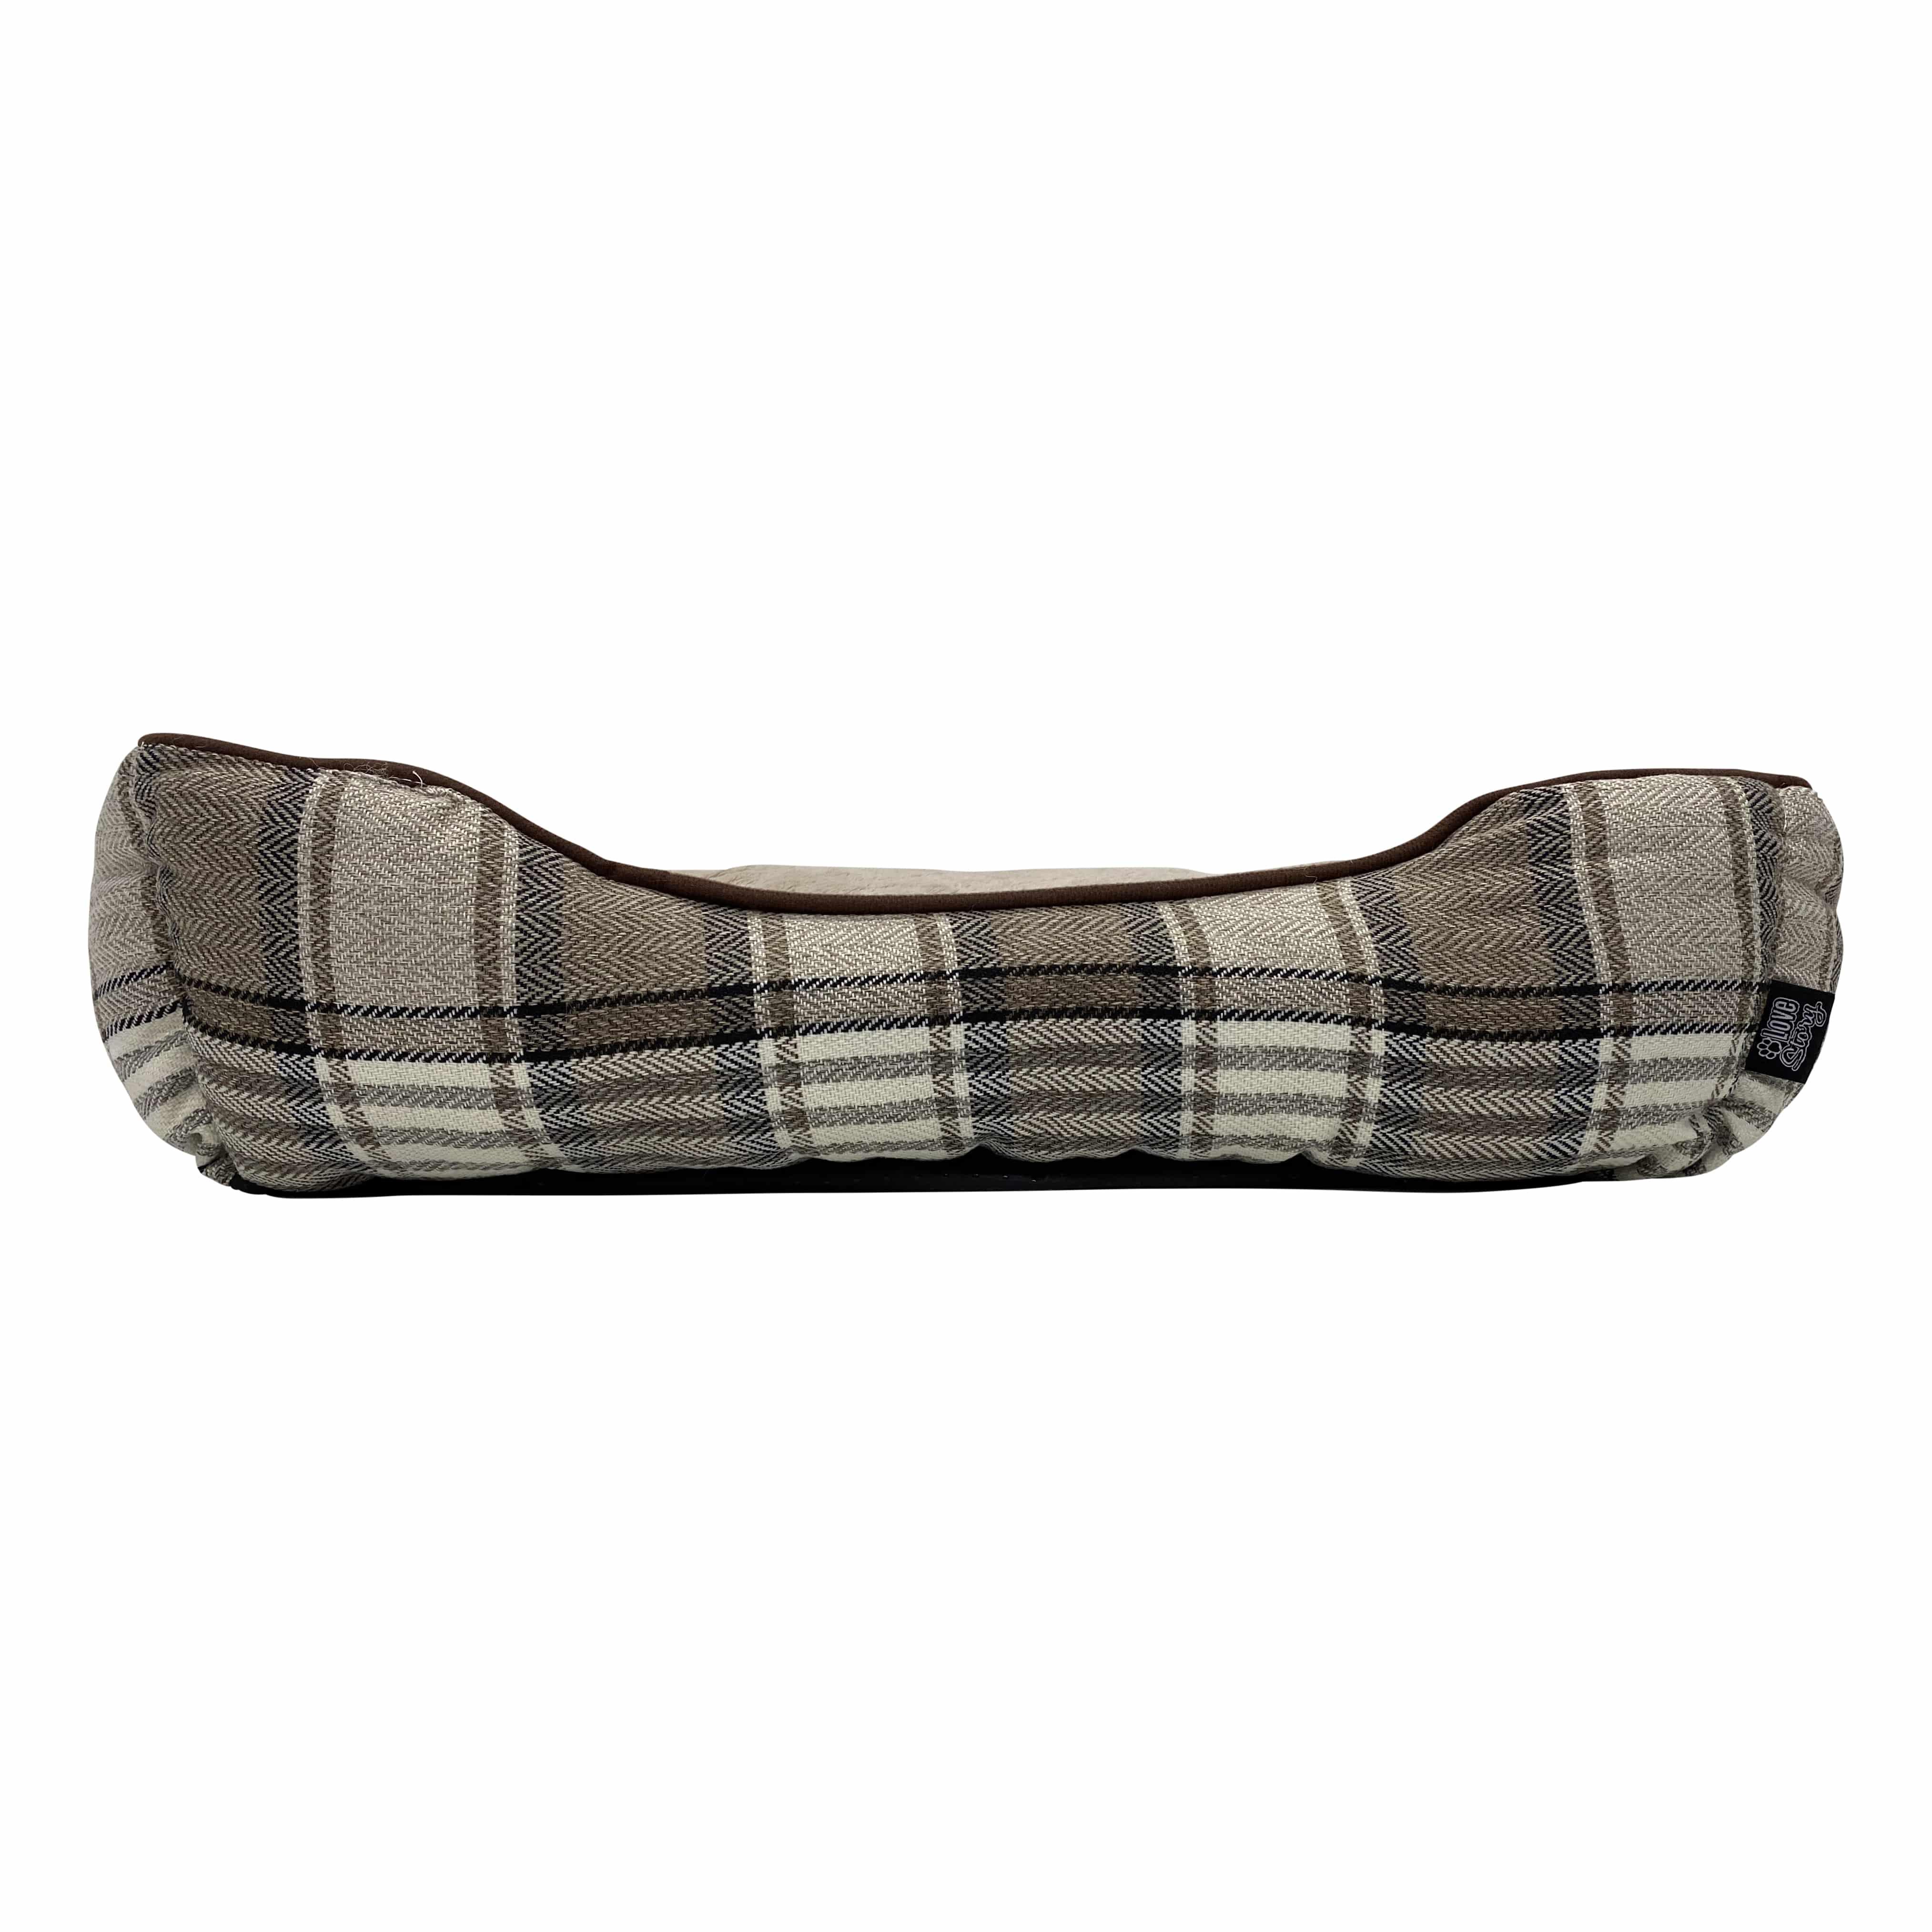 4Goodz hondenmand rechthoekig schotse ruit - 55x43 cm - Taupe